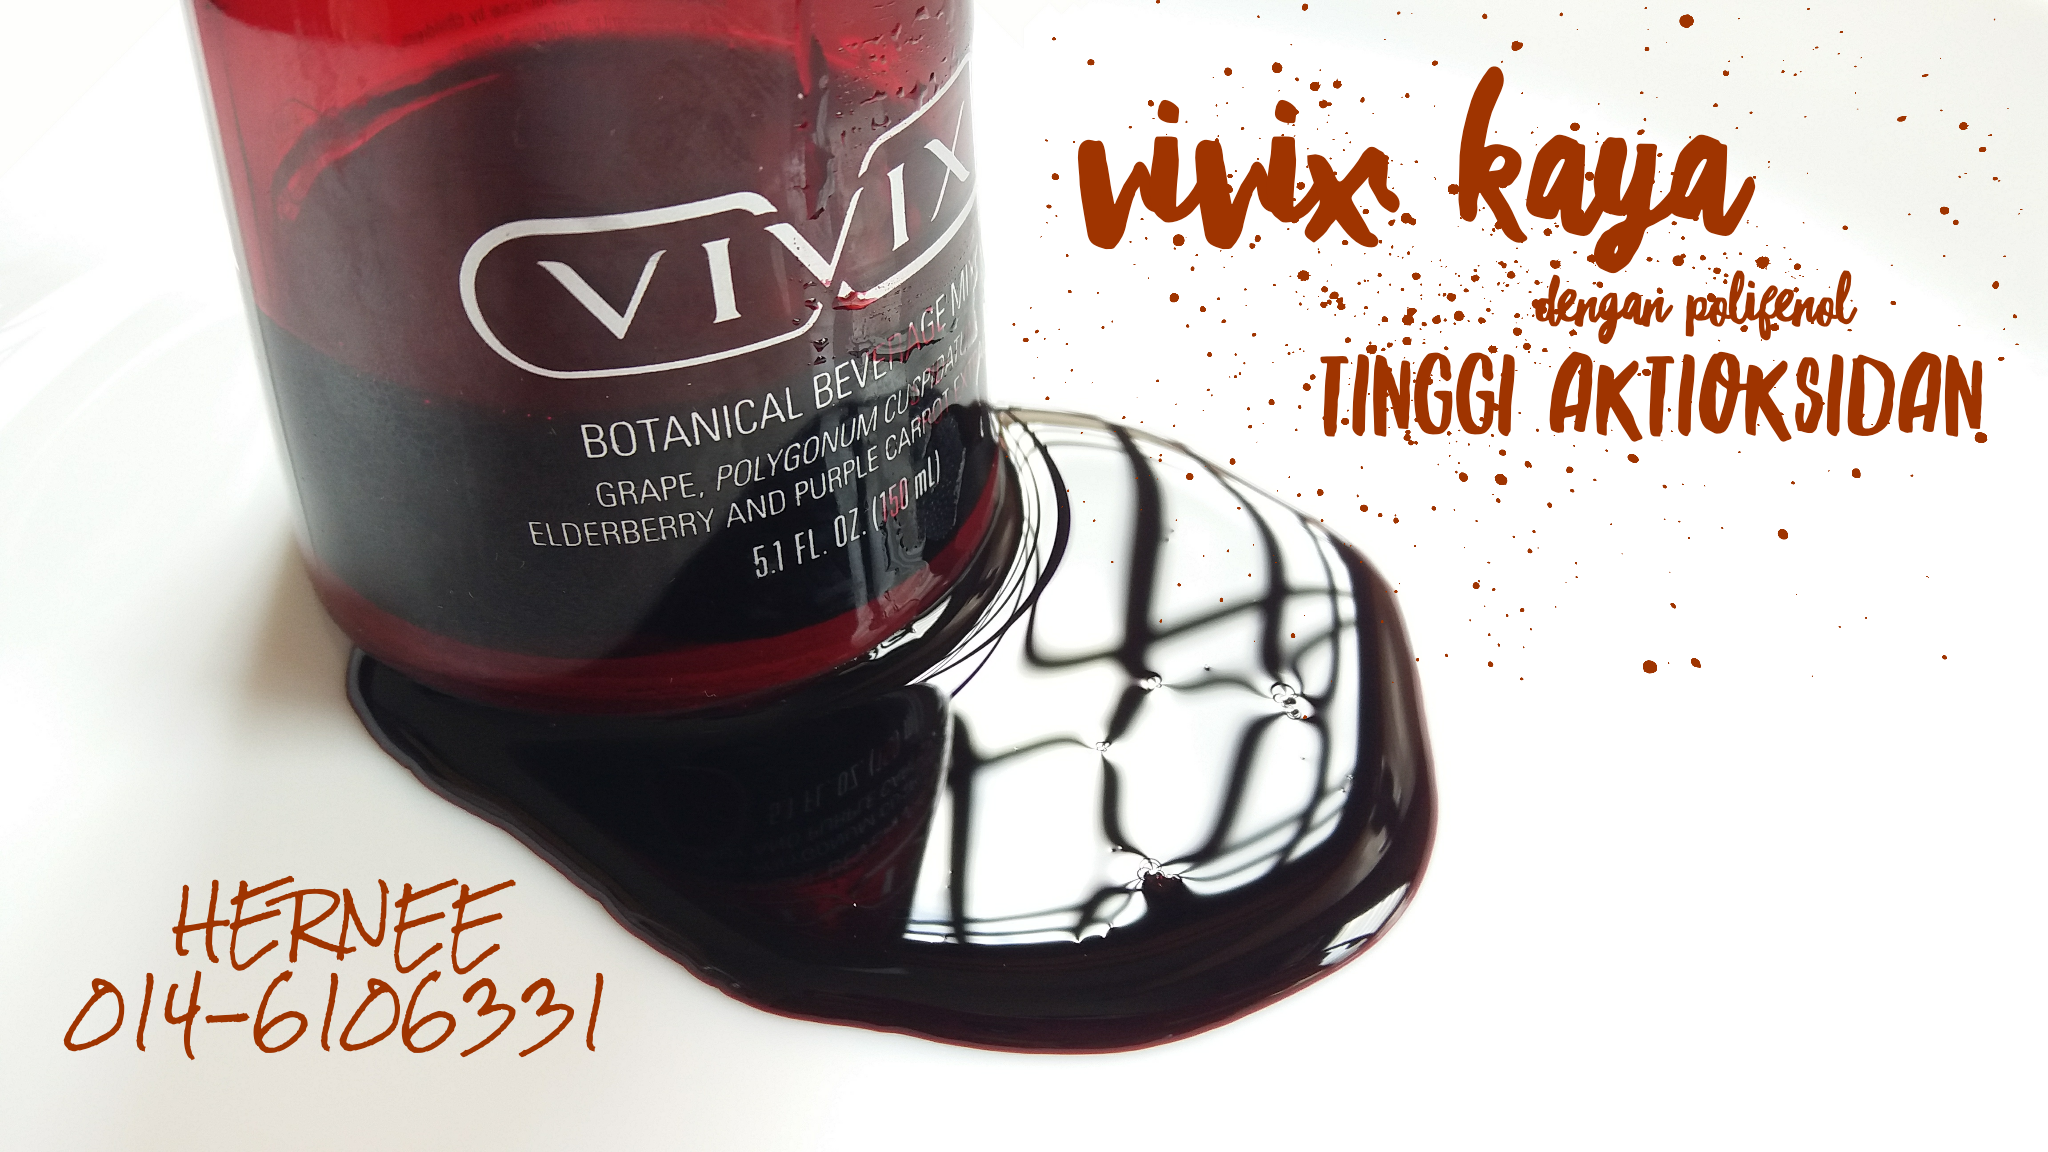 Vivix Kaya Dengan Polifenol & Tinggi Antioksidan